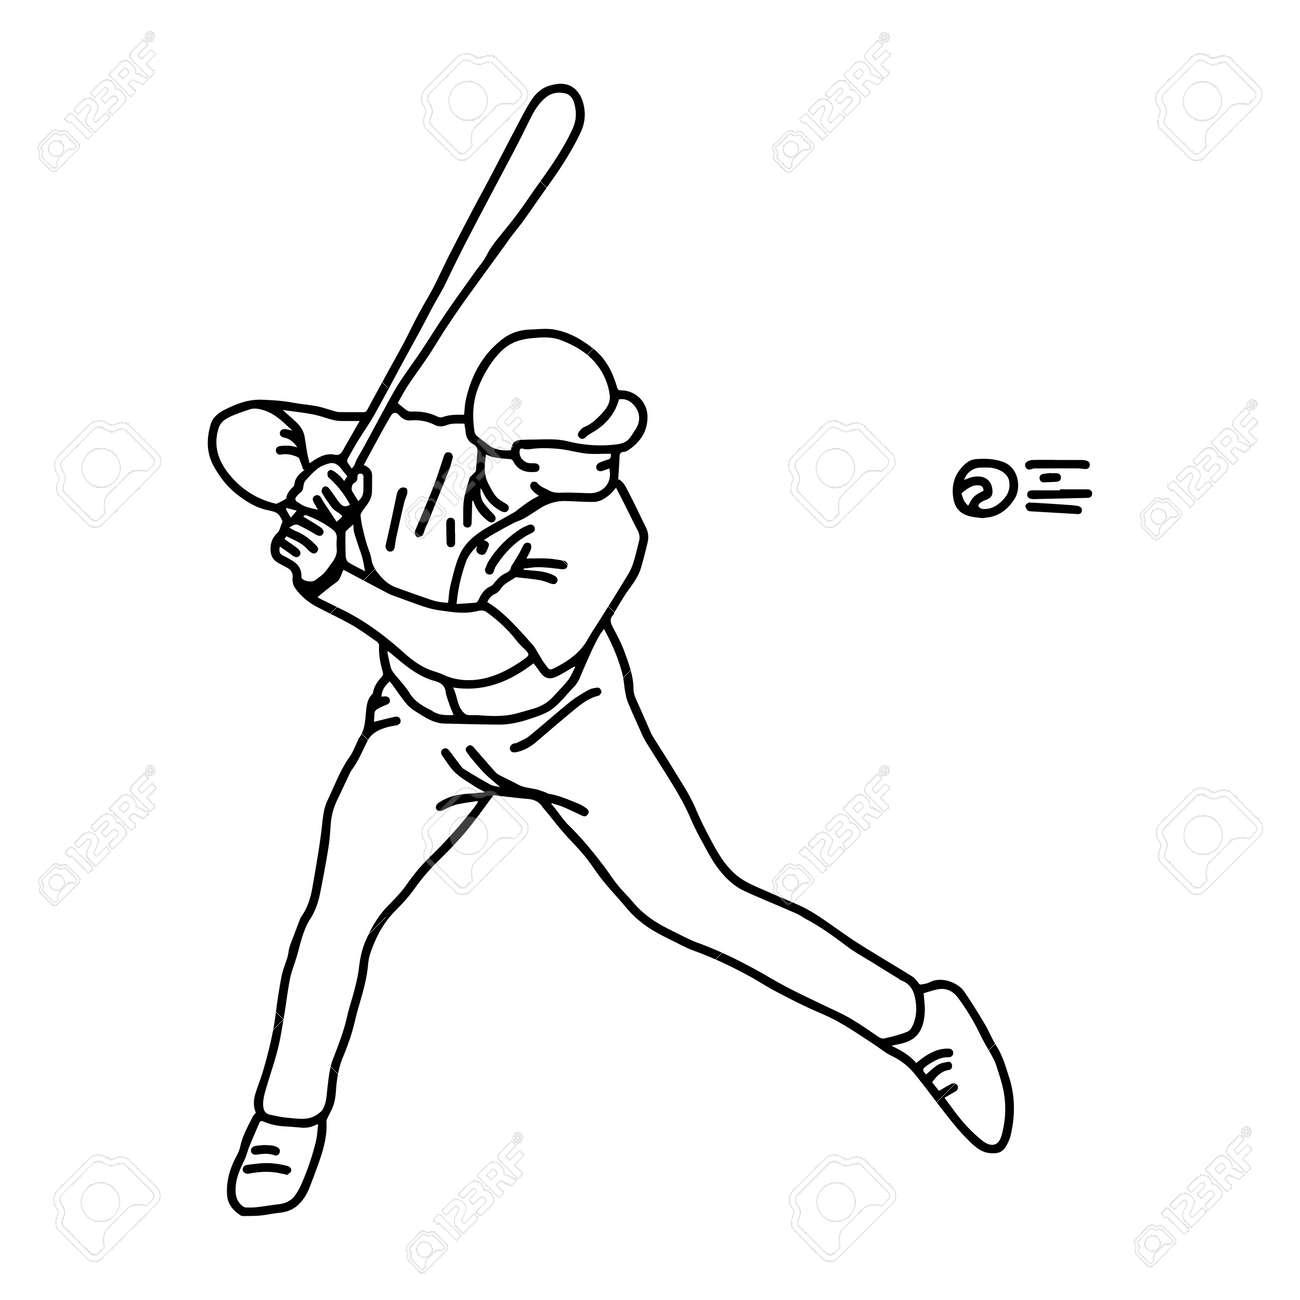 Baseball Throws Ball Vector Illustration Sketch Hand Drawn